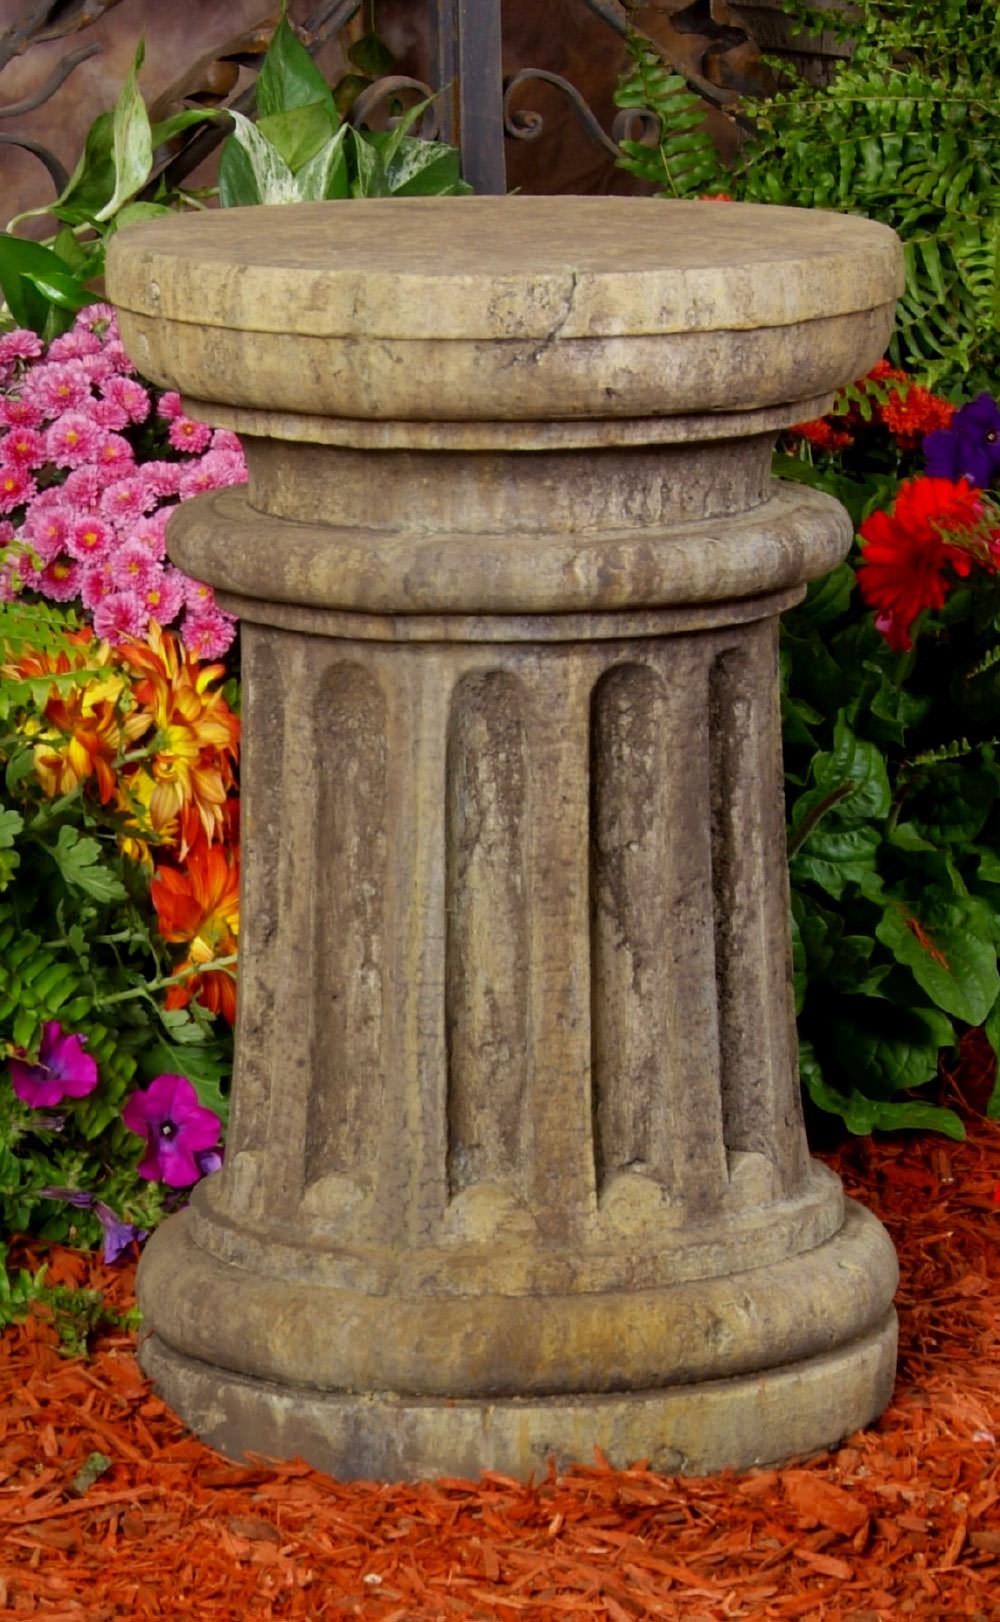 54005_Fat_Column_Sundial | Unique Stone | Antique & Garden Reproductions